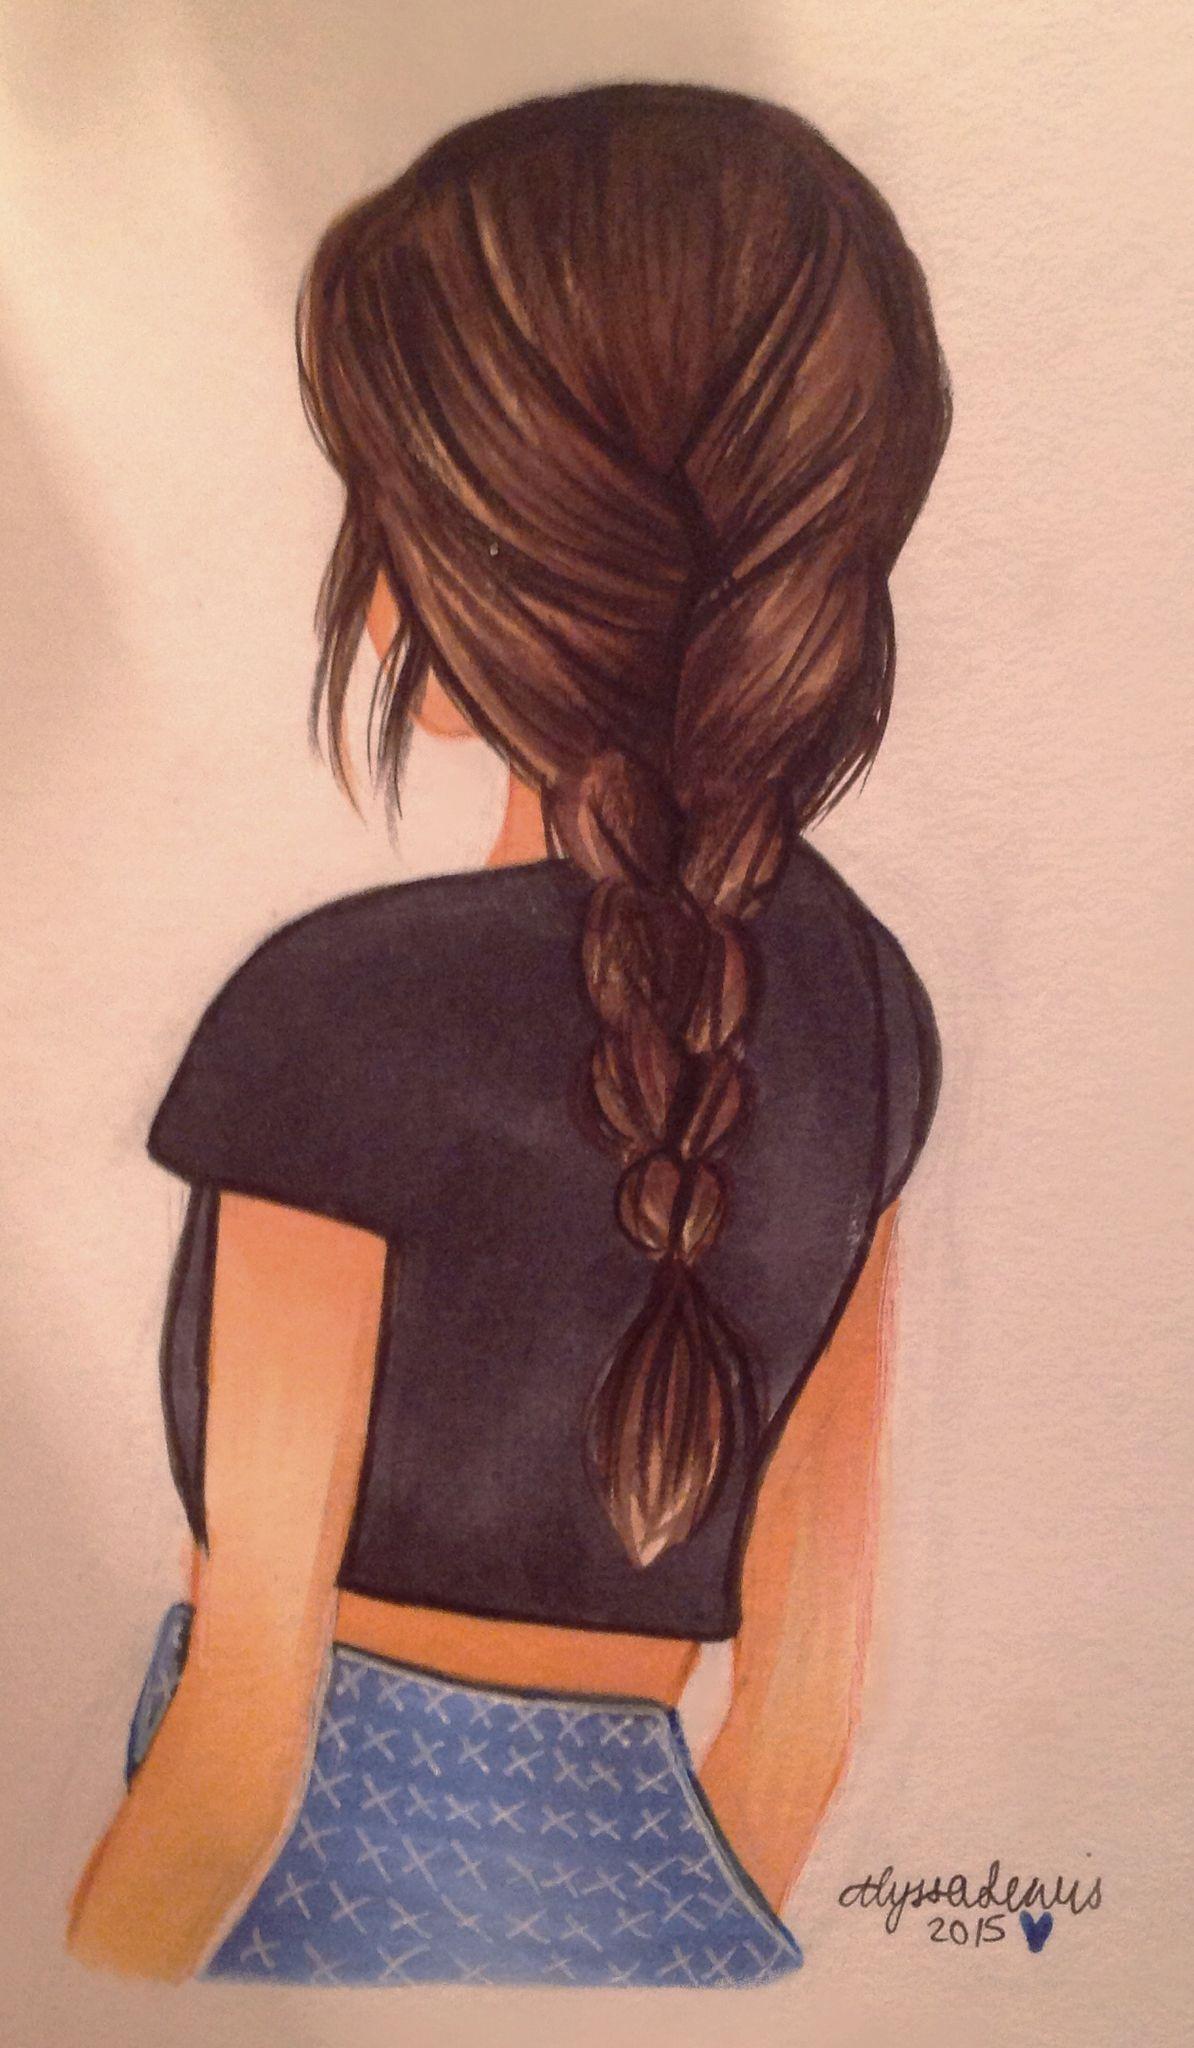 Inktober #6 - Random drawing of a girl. Drawn with Copics and Polychromos. By Alyssa Lewis (@artyalyssa)